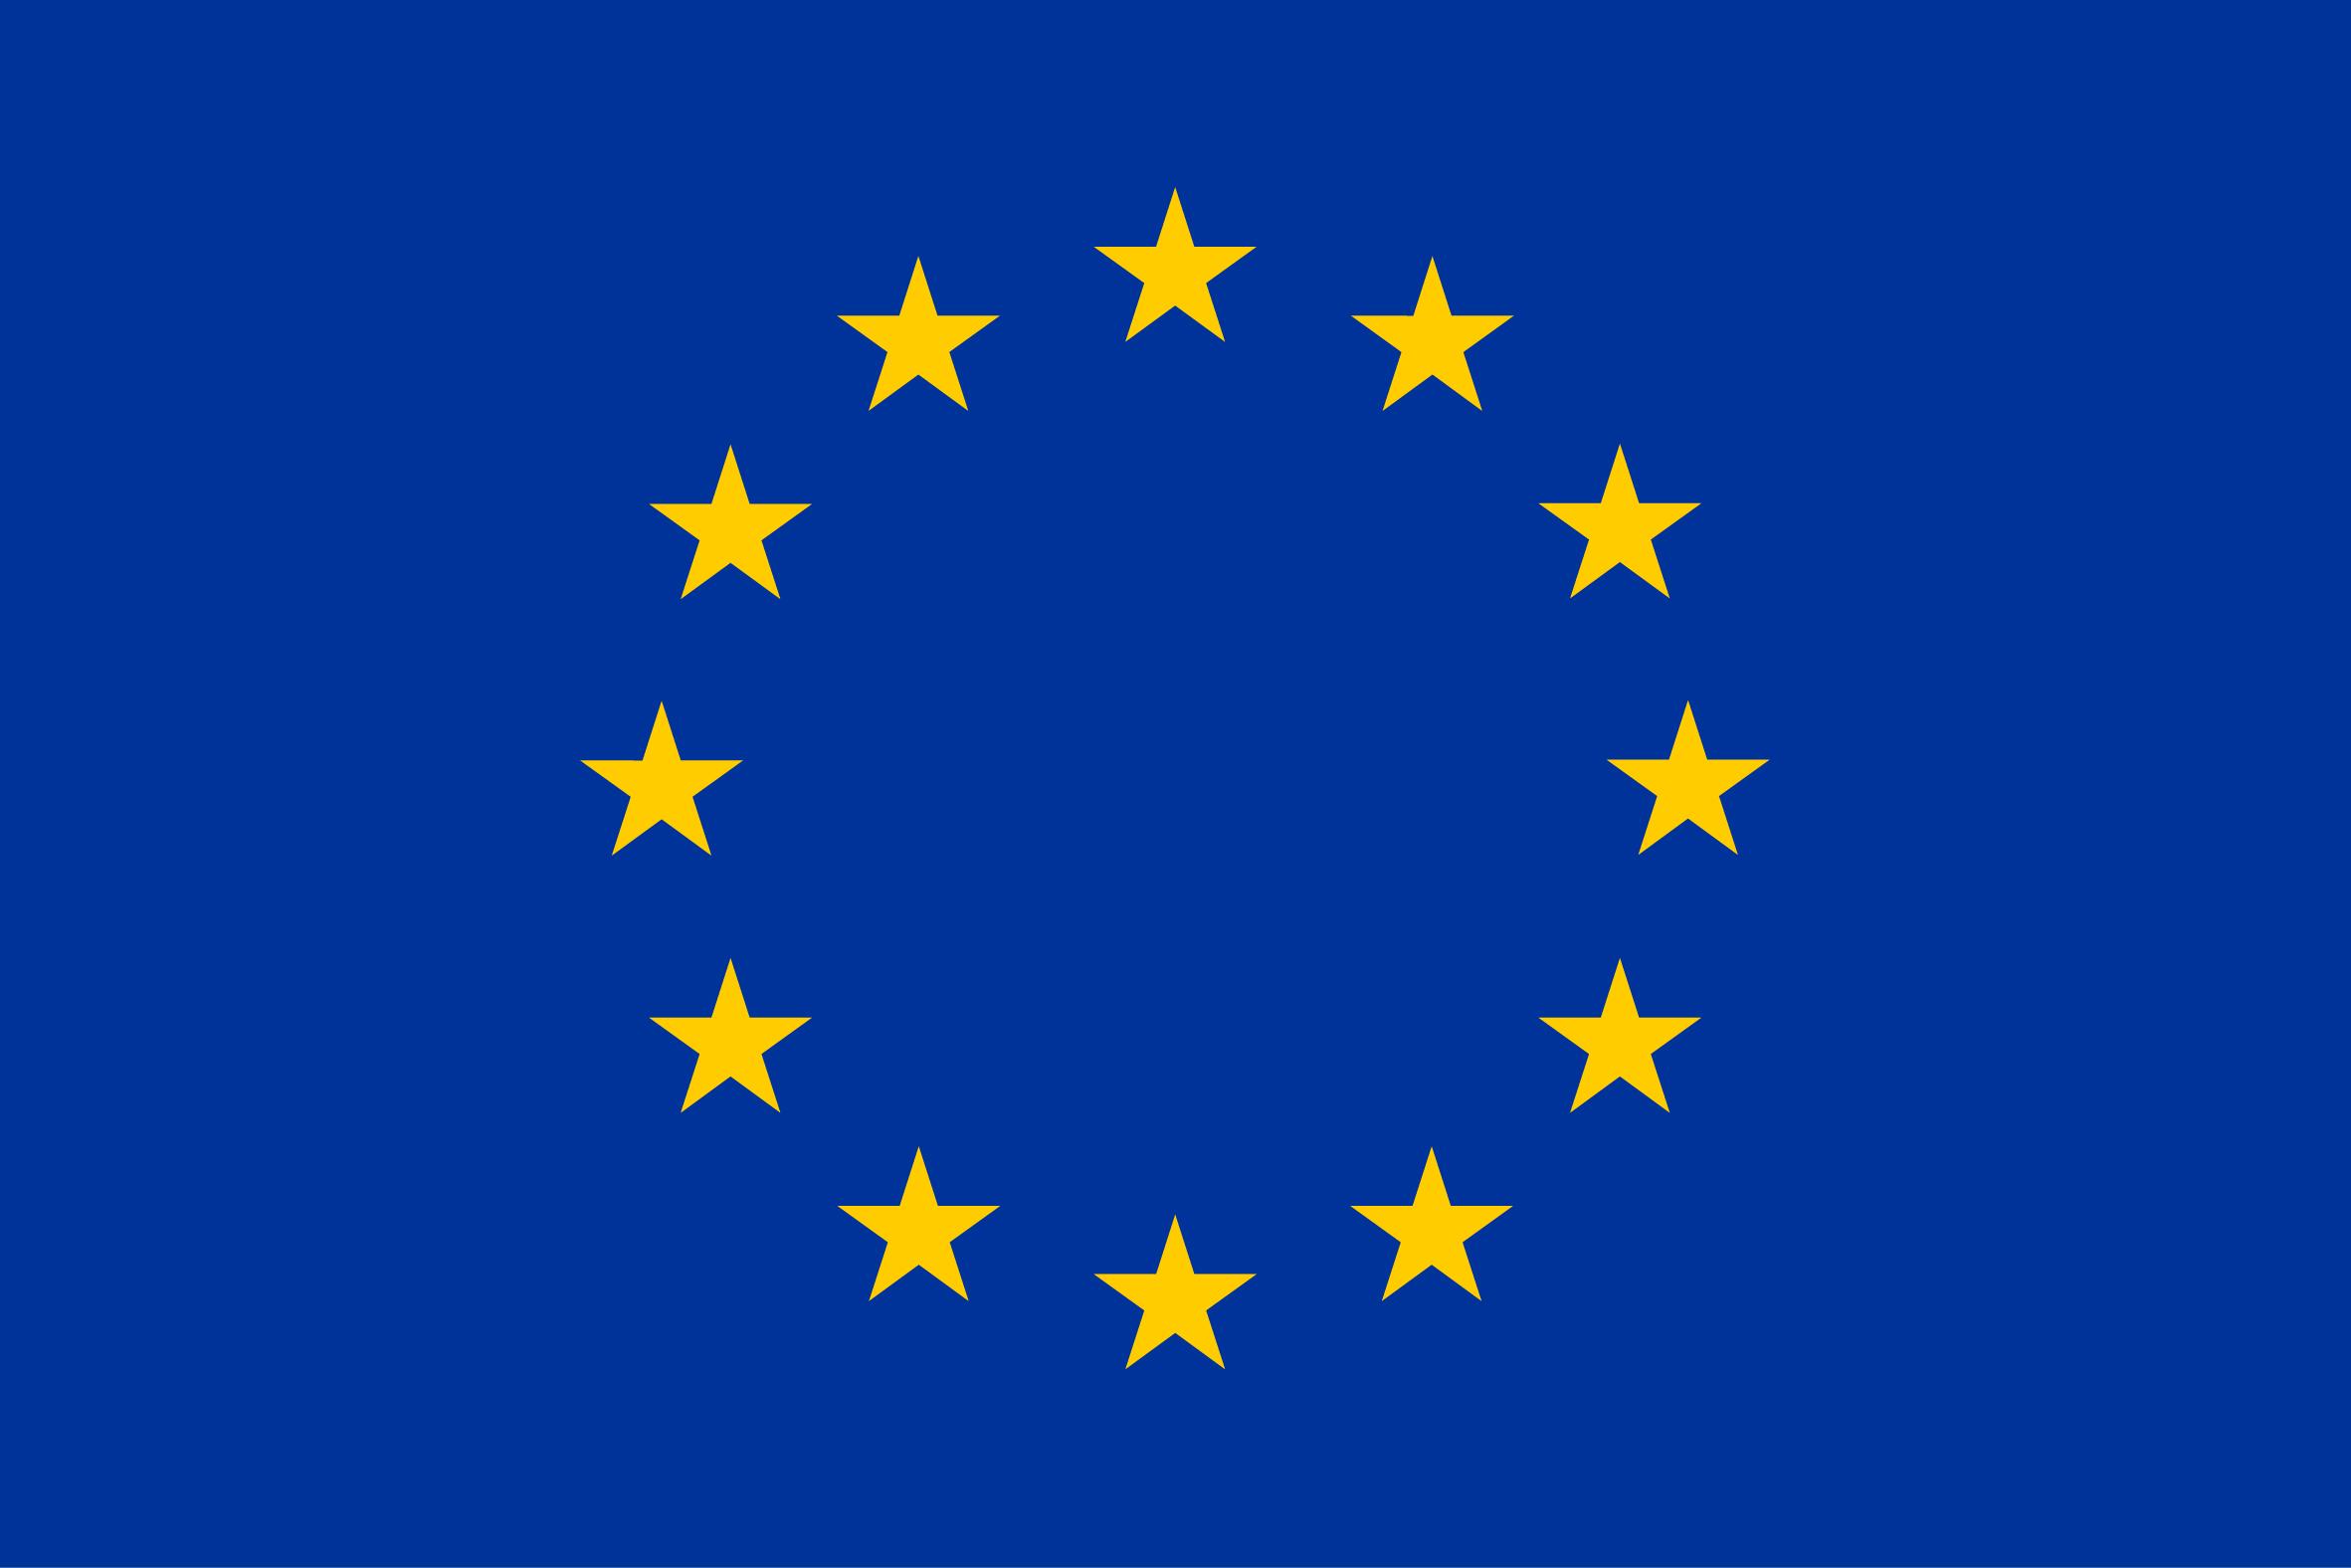 flag_EU_yellow_high